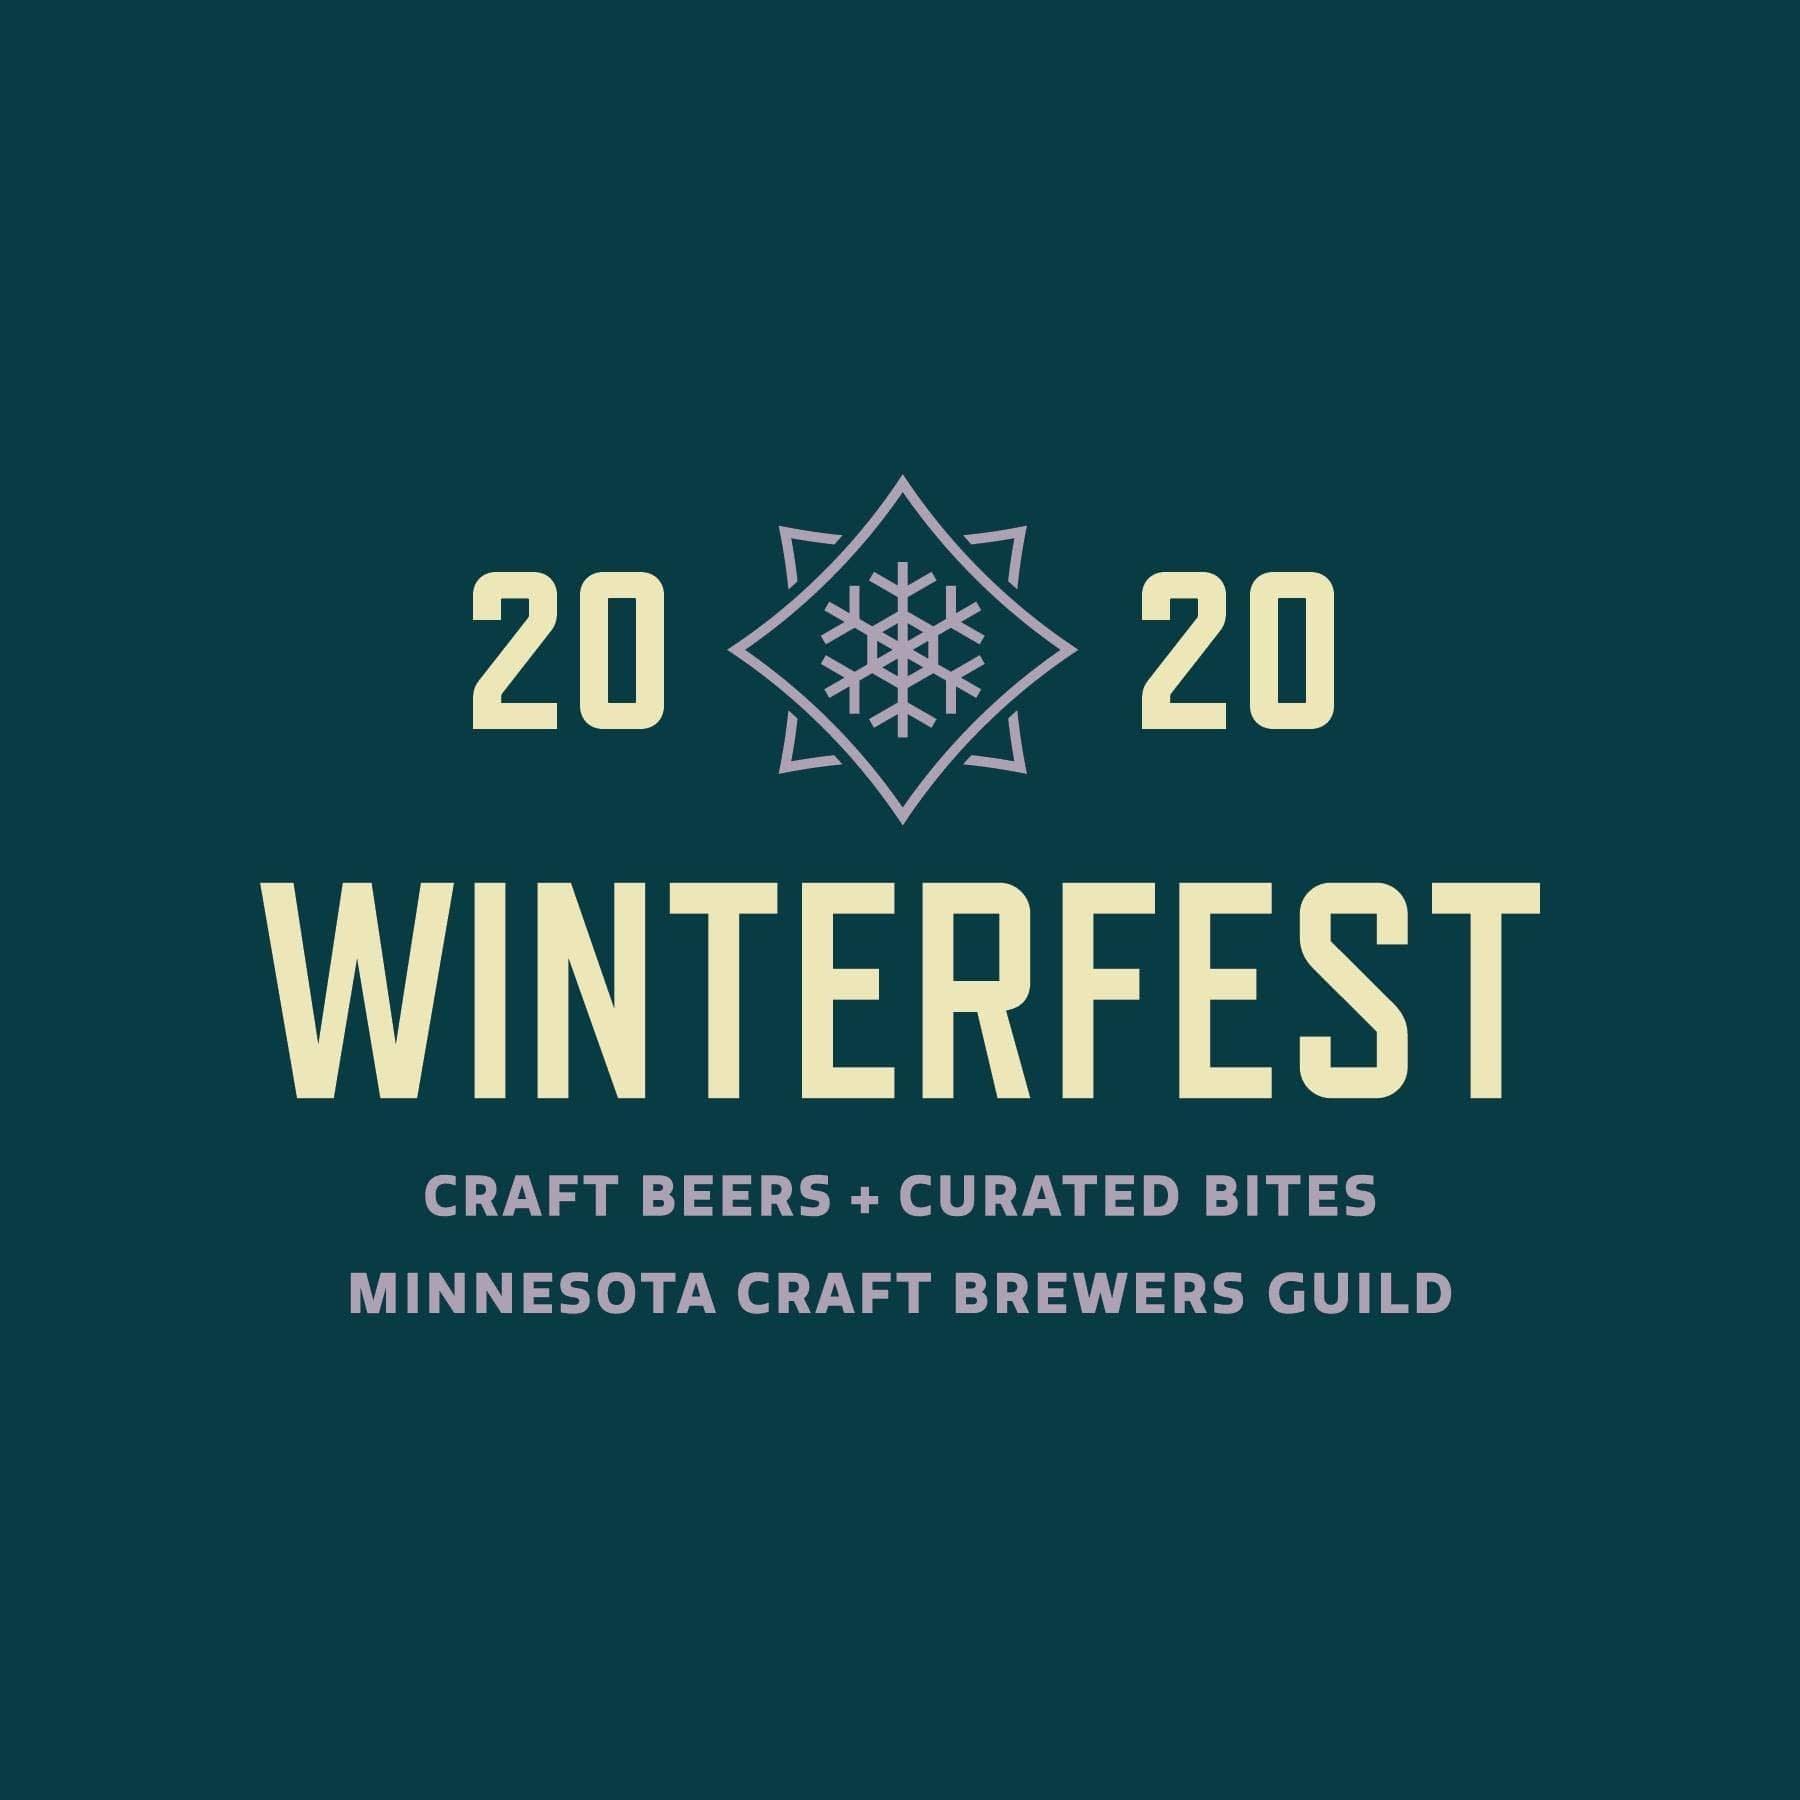 Minnesota Craft Brewers Guild Winterfest